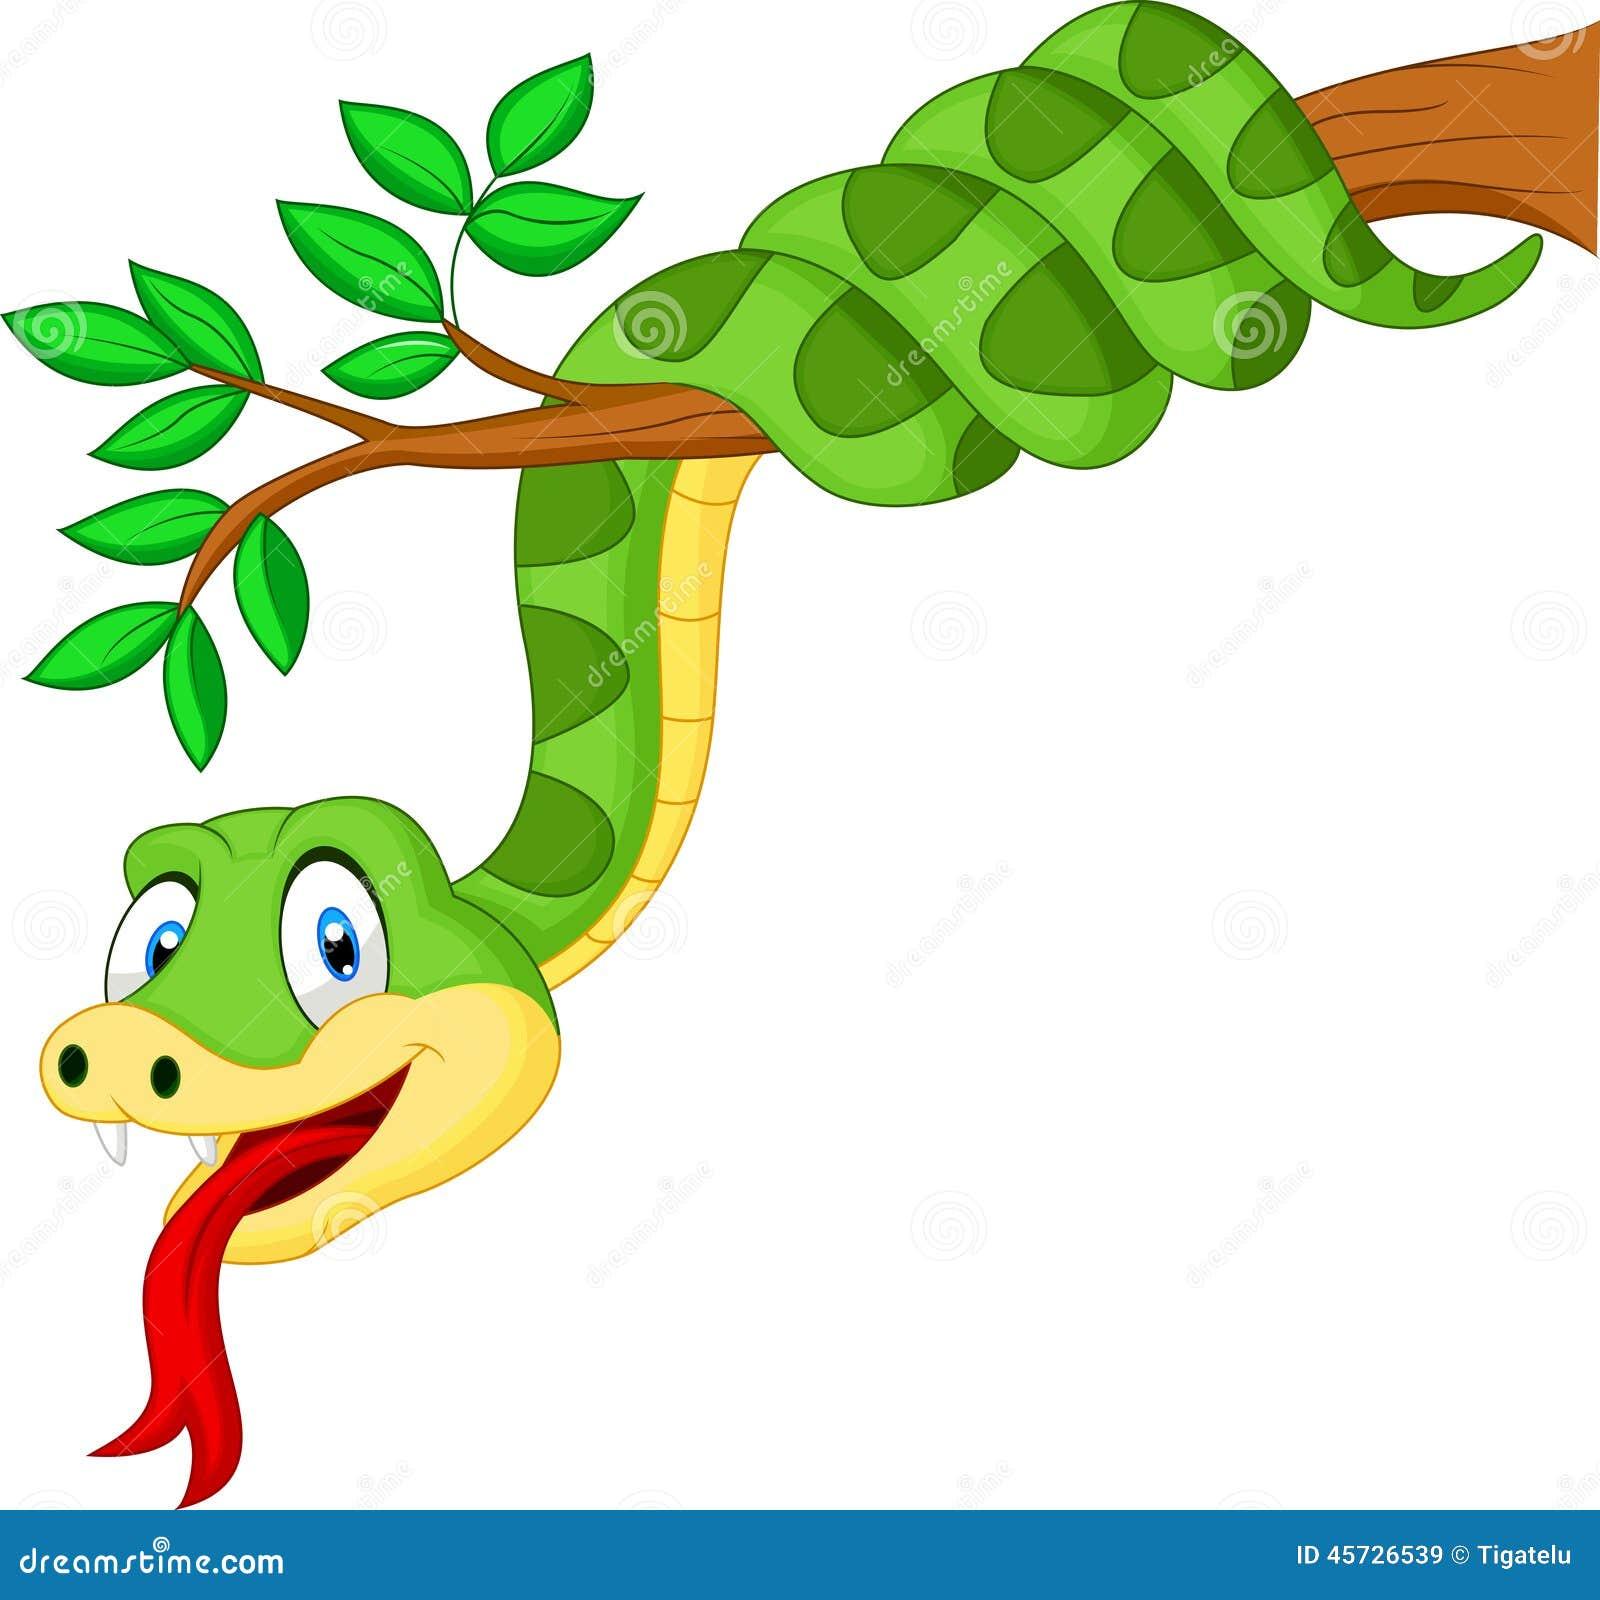 Green snake cartoon royalty free stock image image 19462406 - Cartoon Green Snake On Branch Royalty Free Stock Images